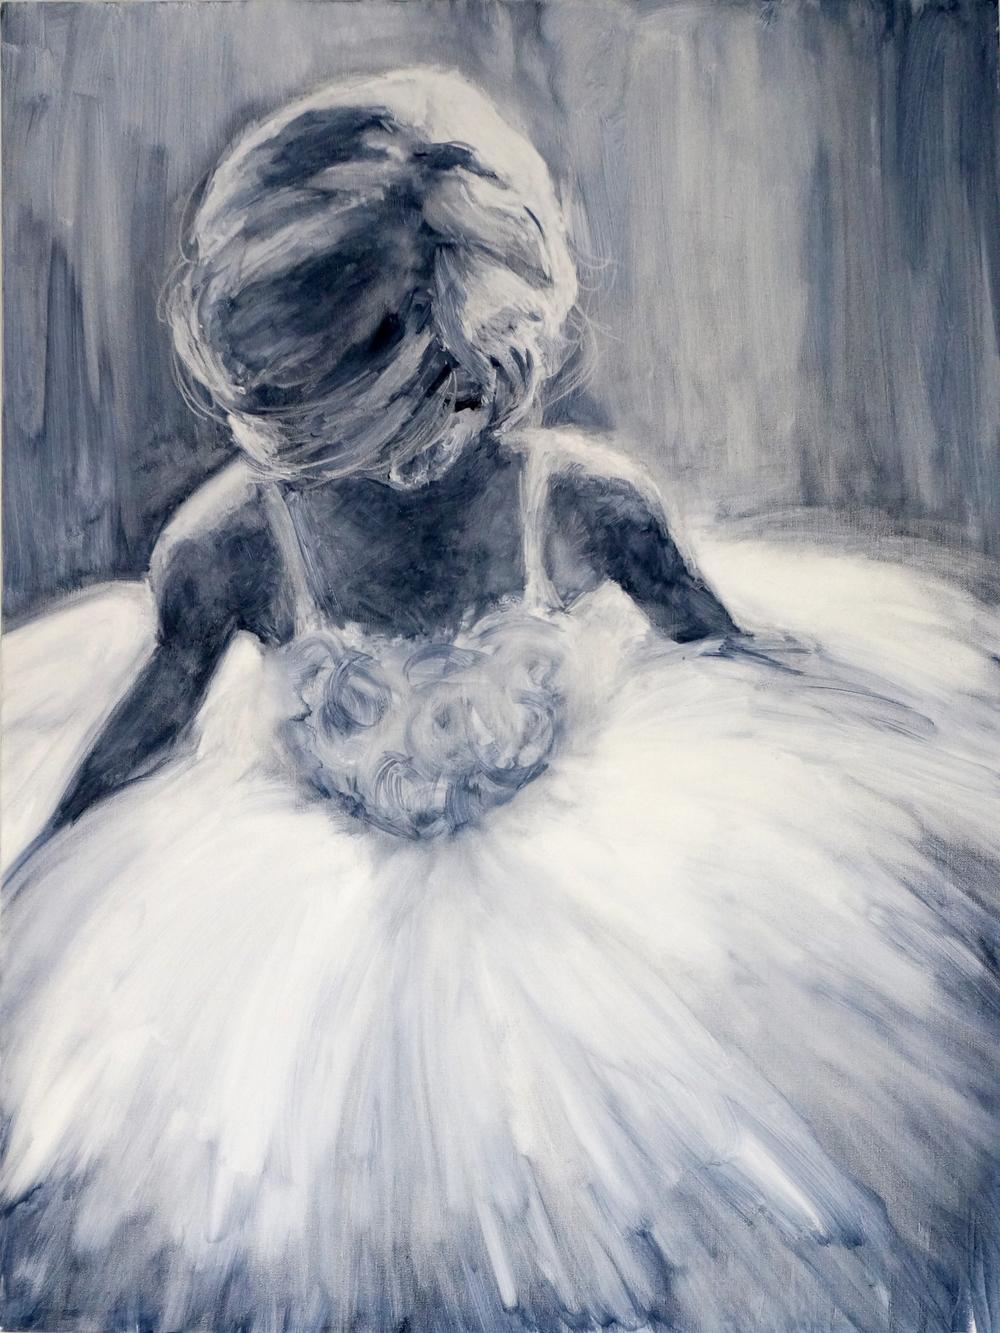 PL - Curtsey Cue - Pretty Lady - Kaitlin Merchant Davison.jpg